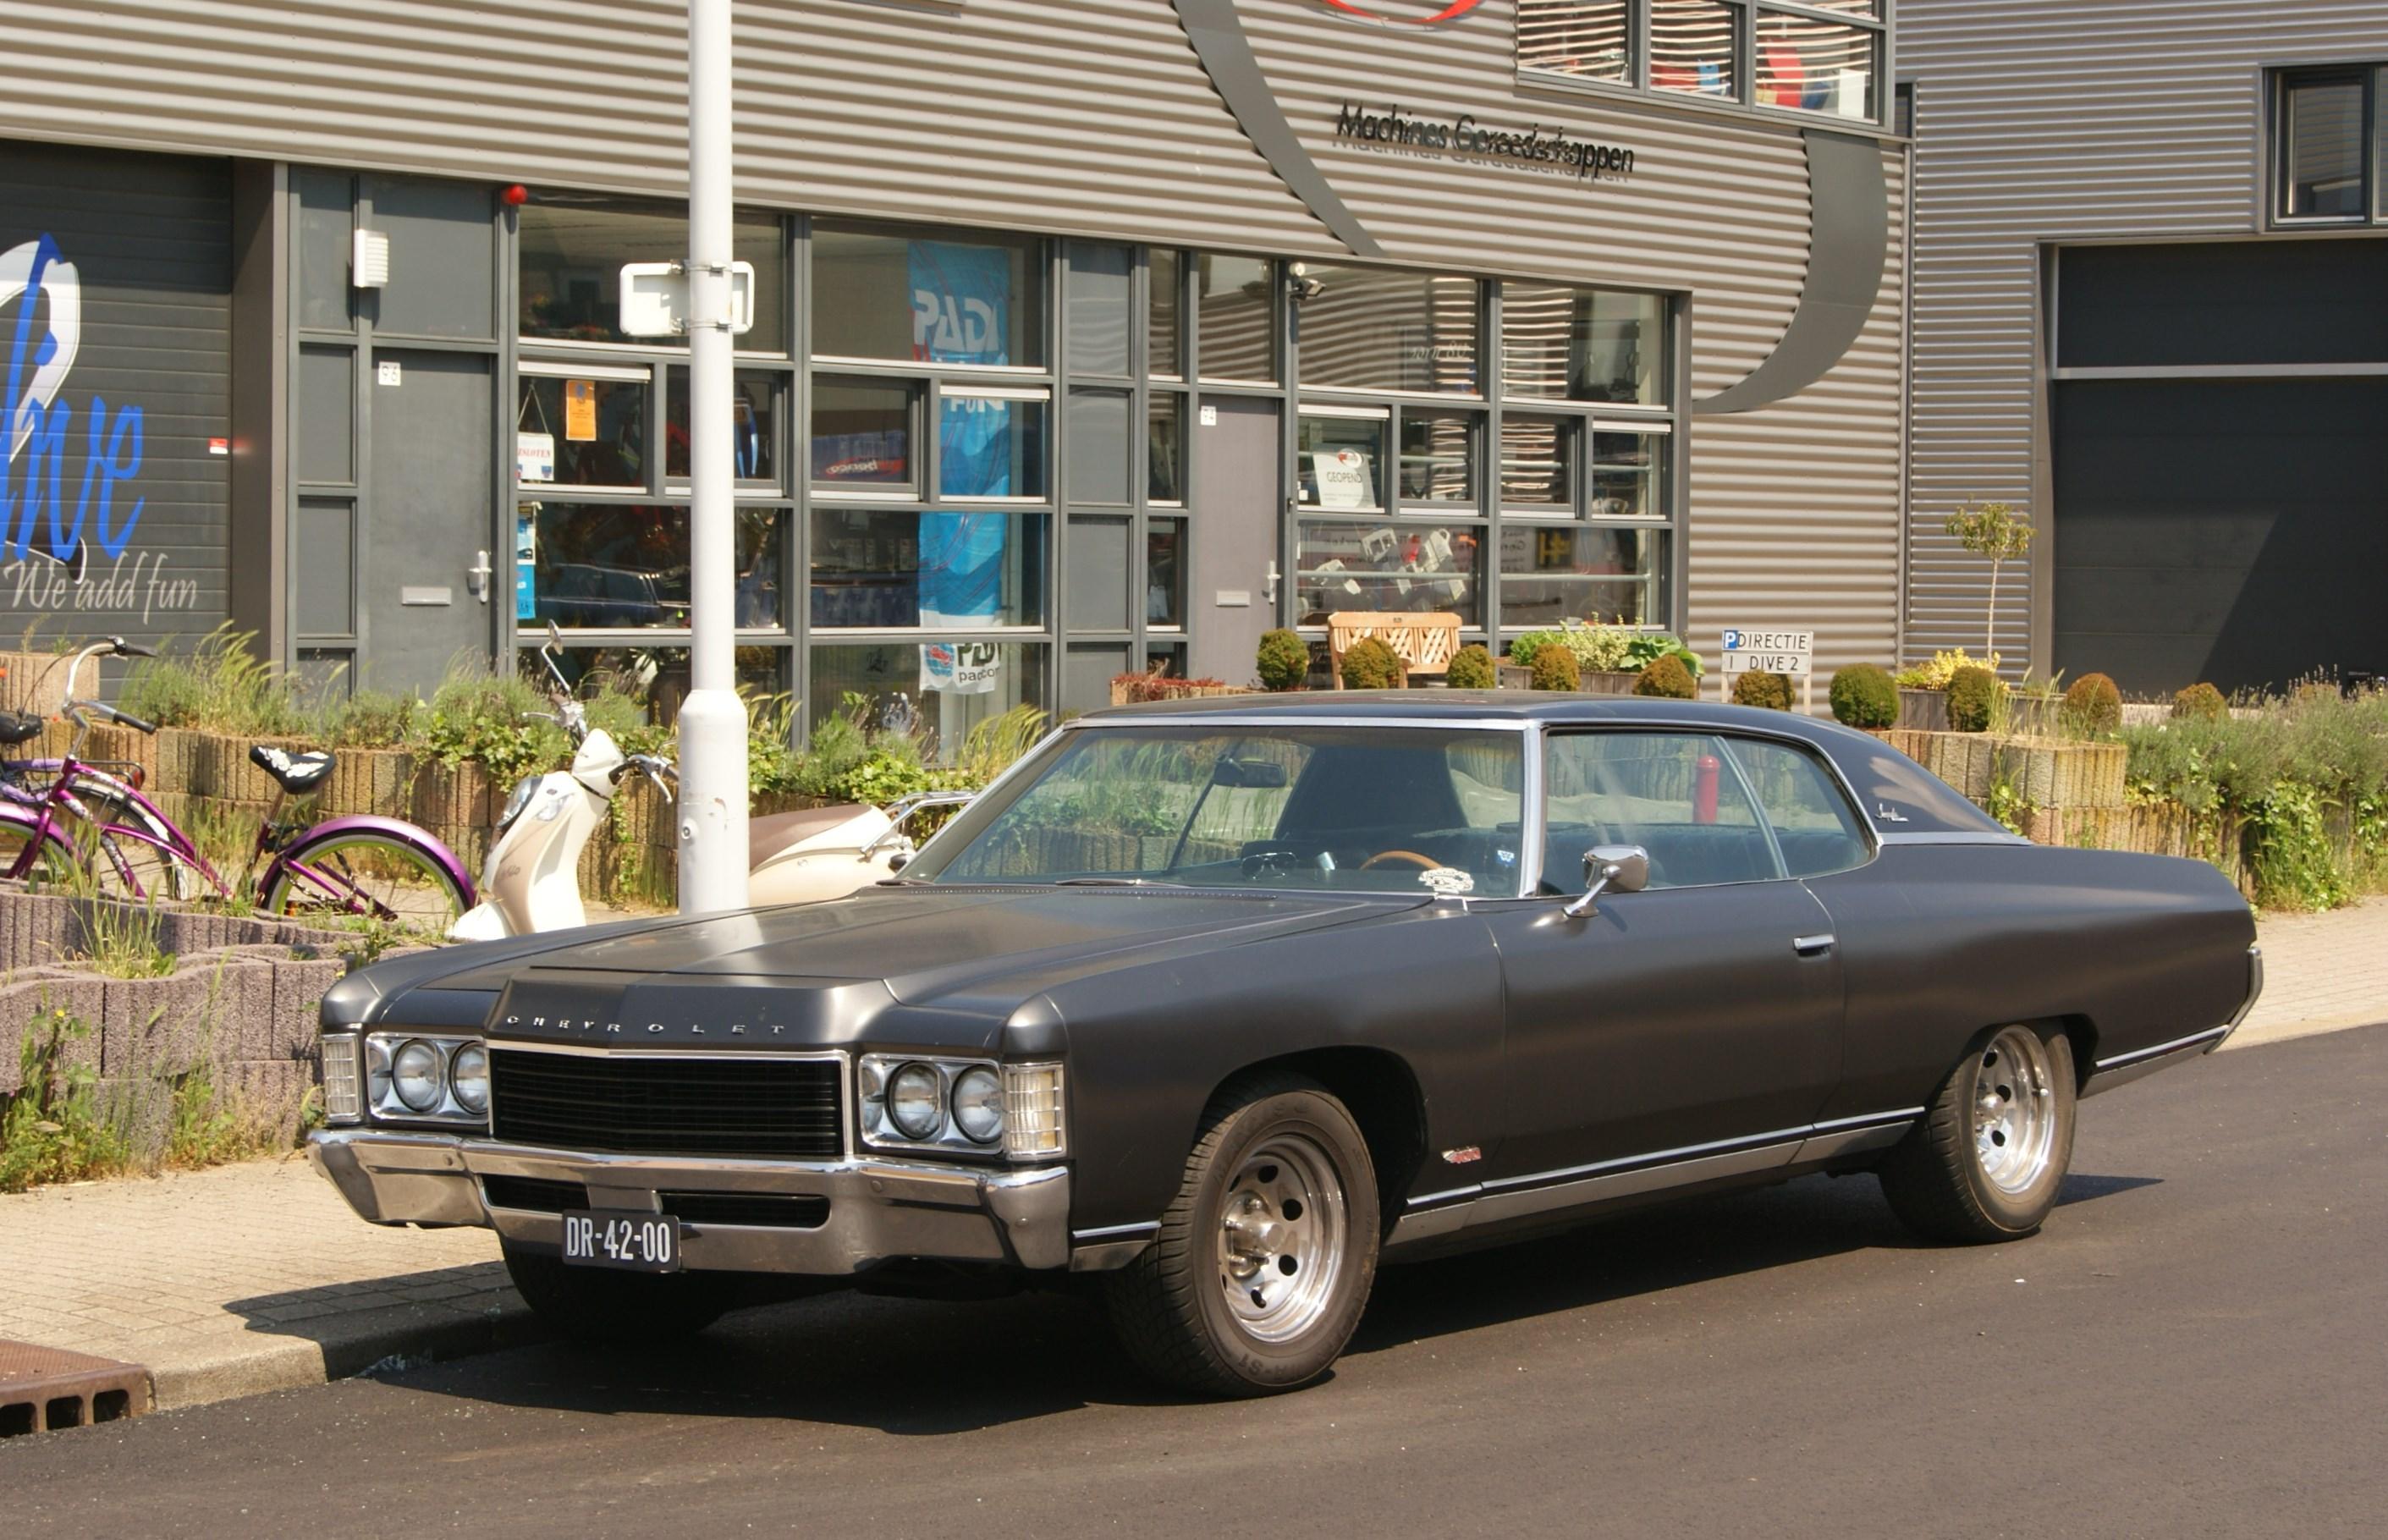 1971_Chevrolet_Impala_Coupe_(8867844631)